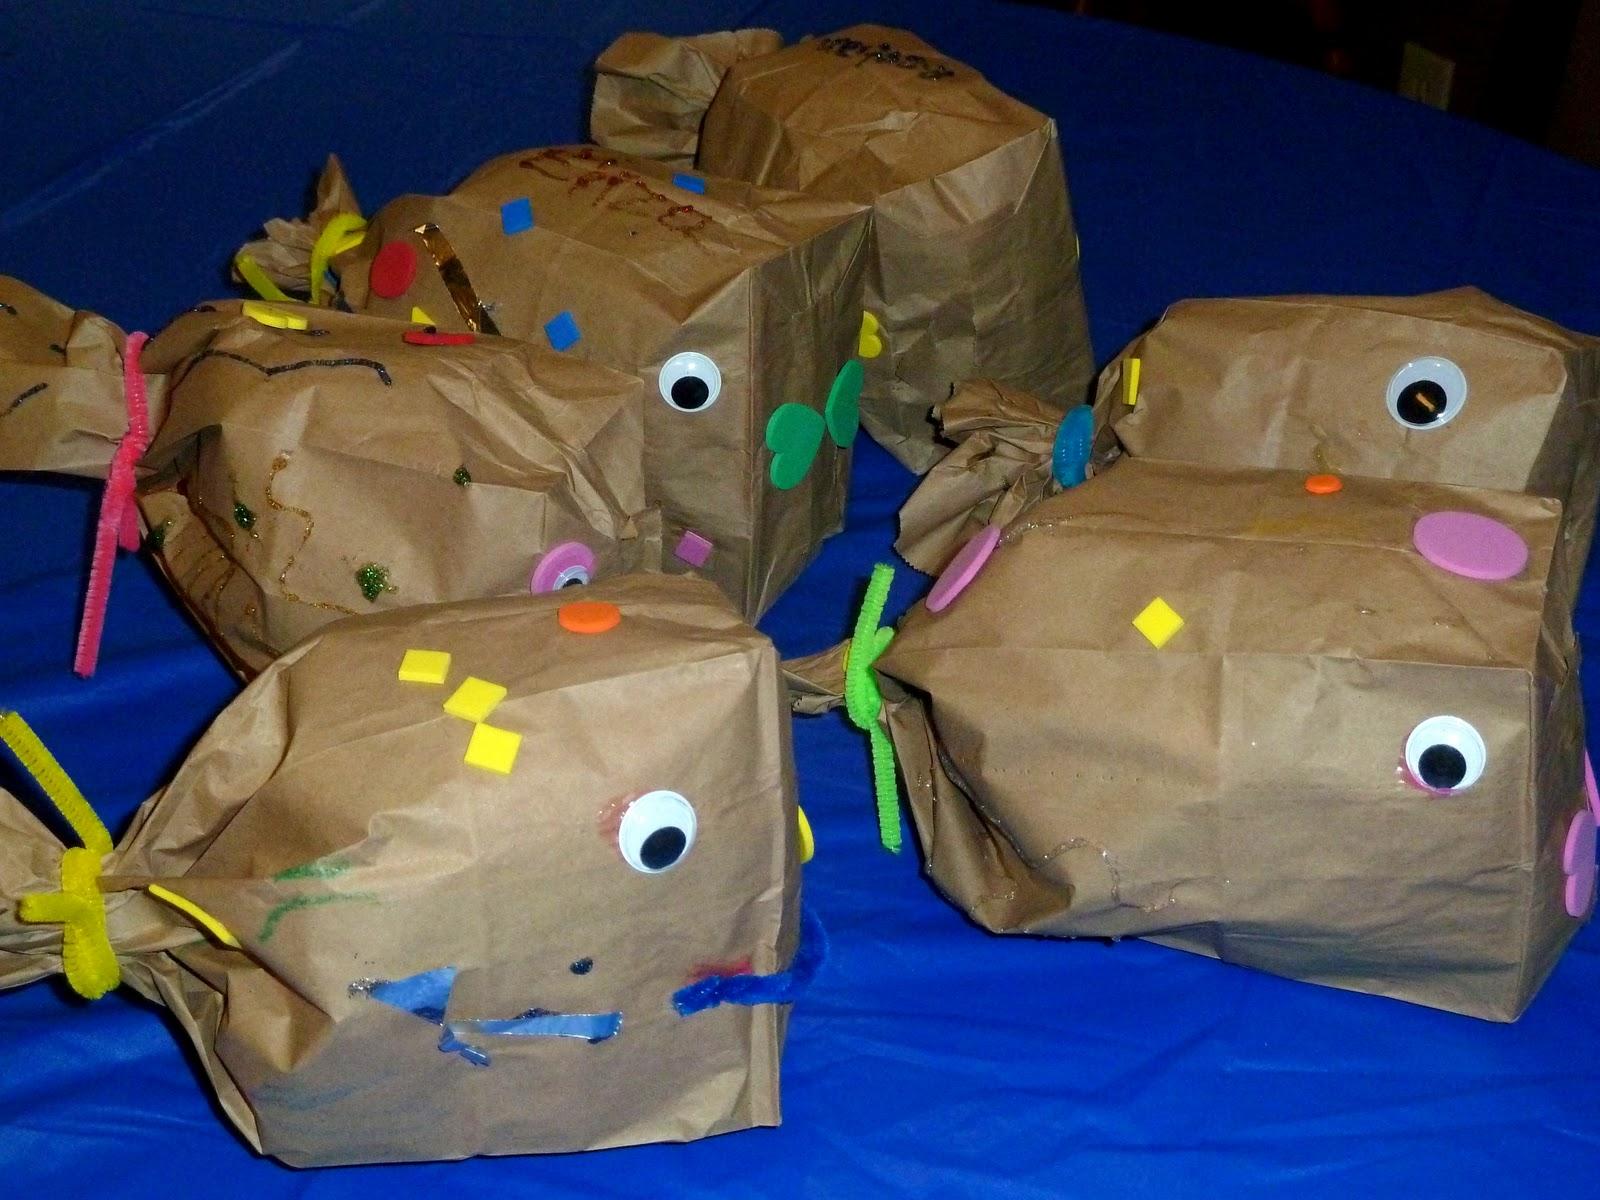 Paper bag activity - Sunday September 12 2010